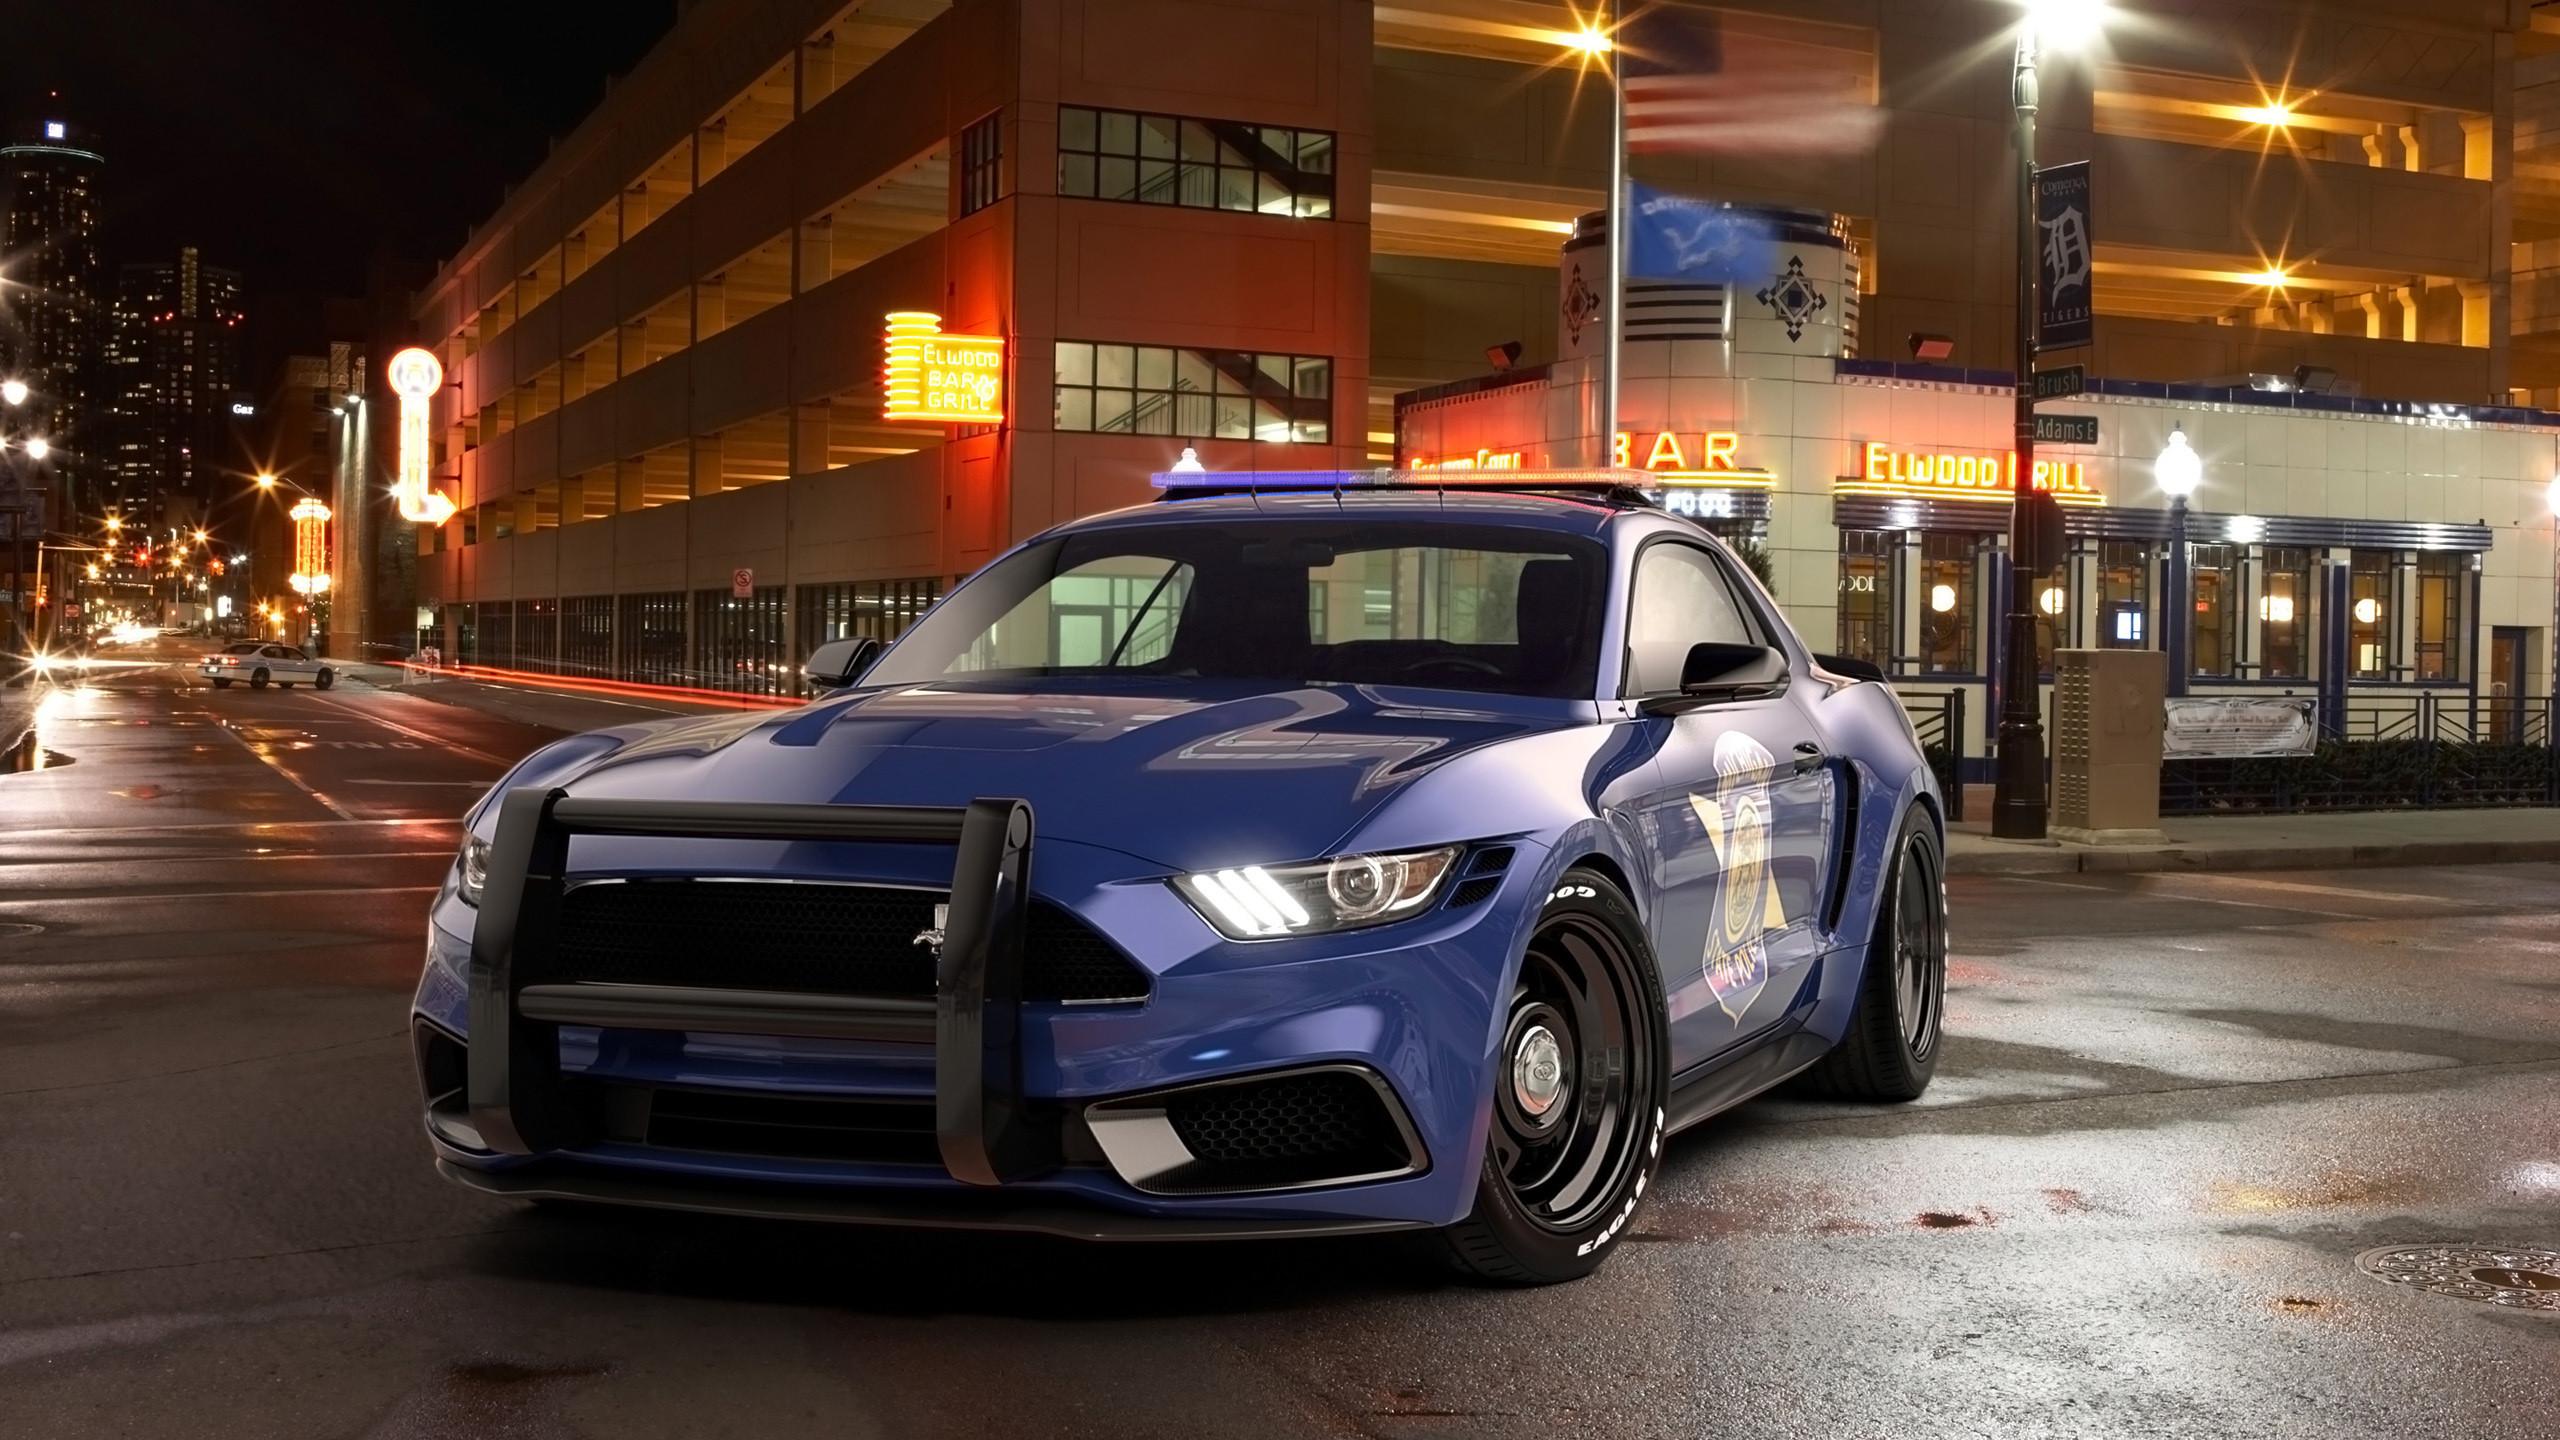 2017 Ford Mustang NotchBack Design Police